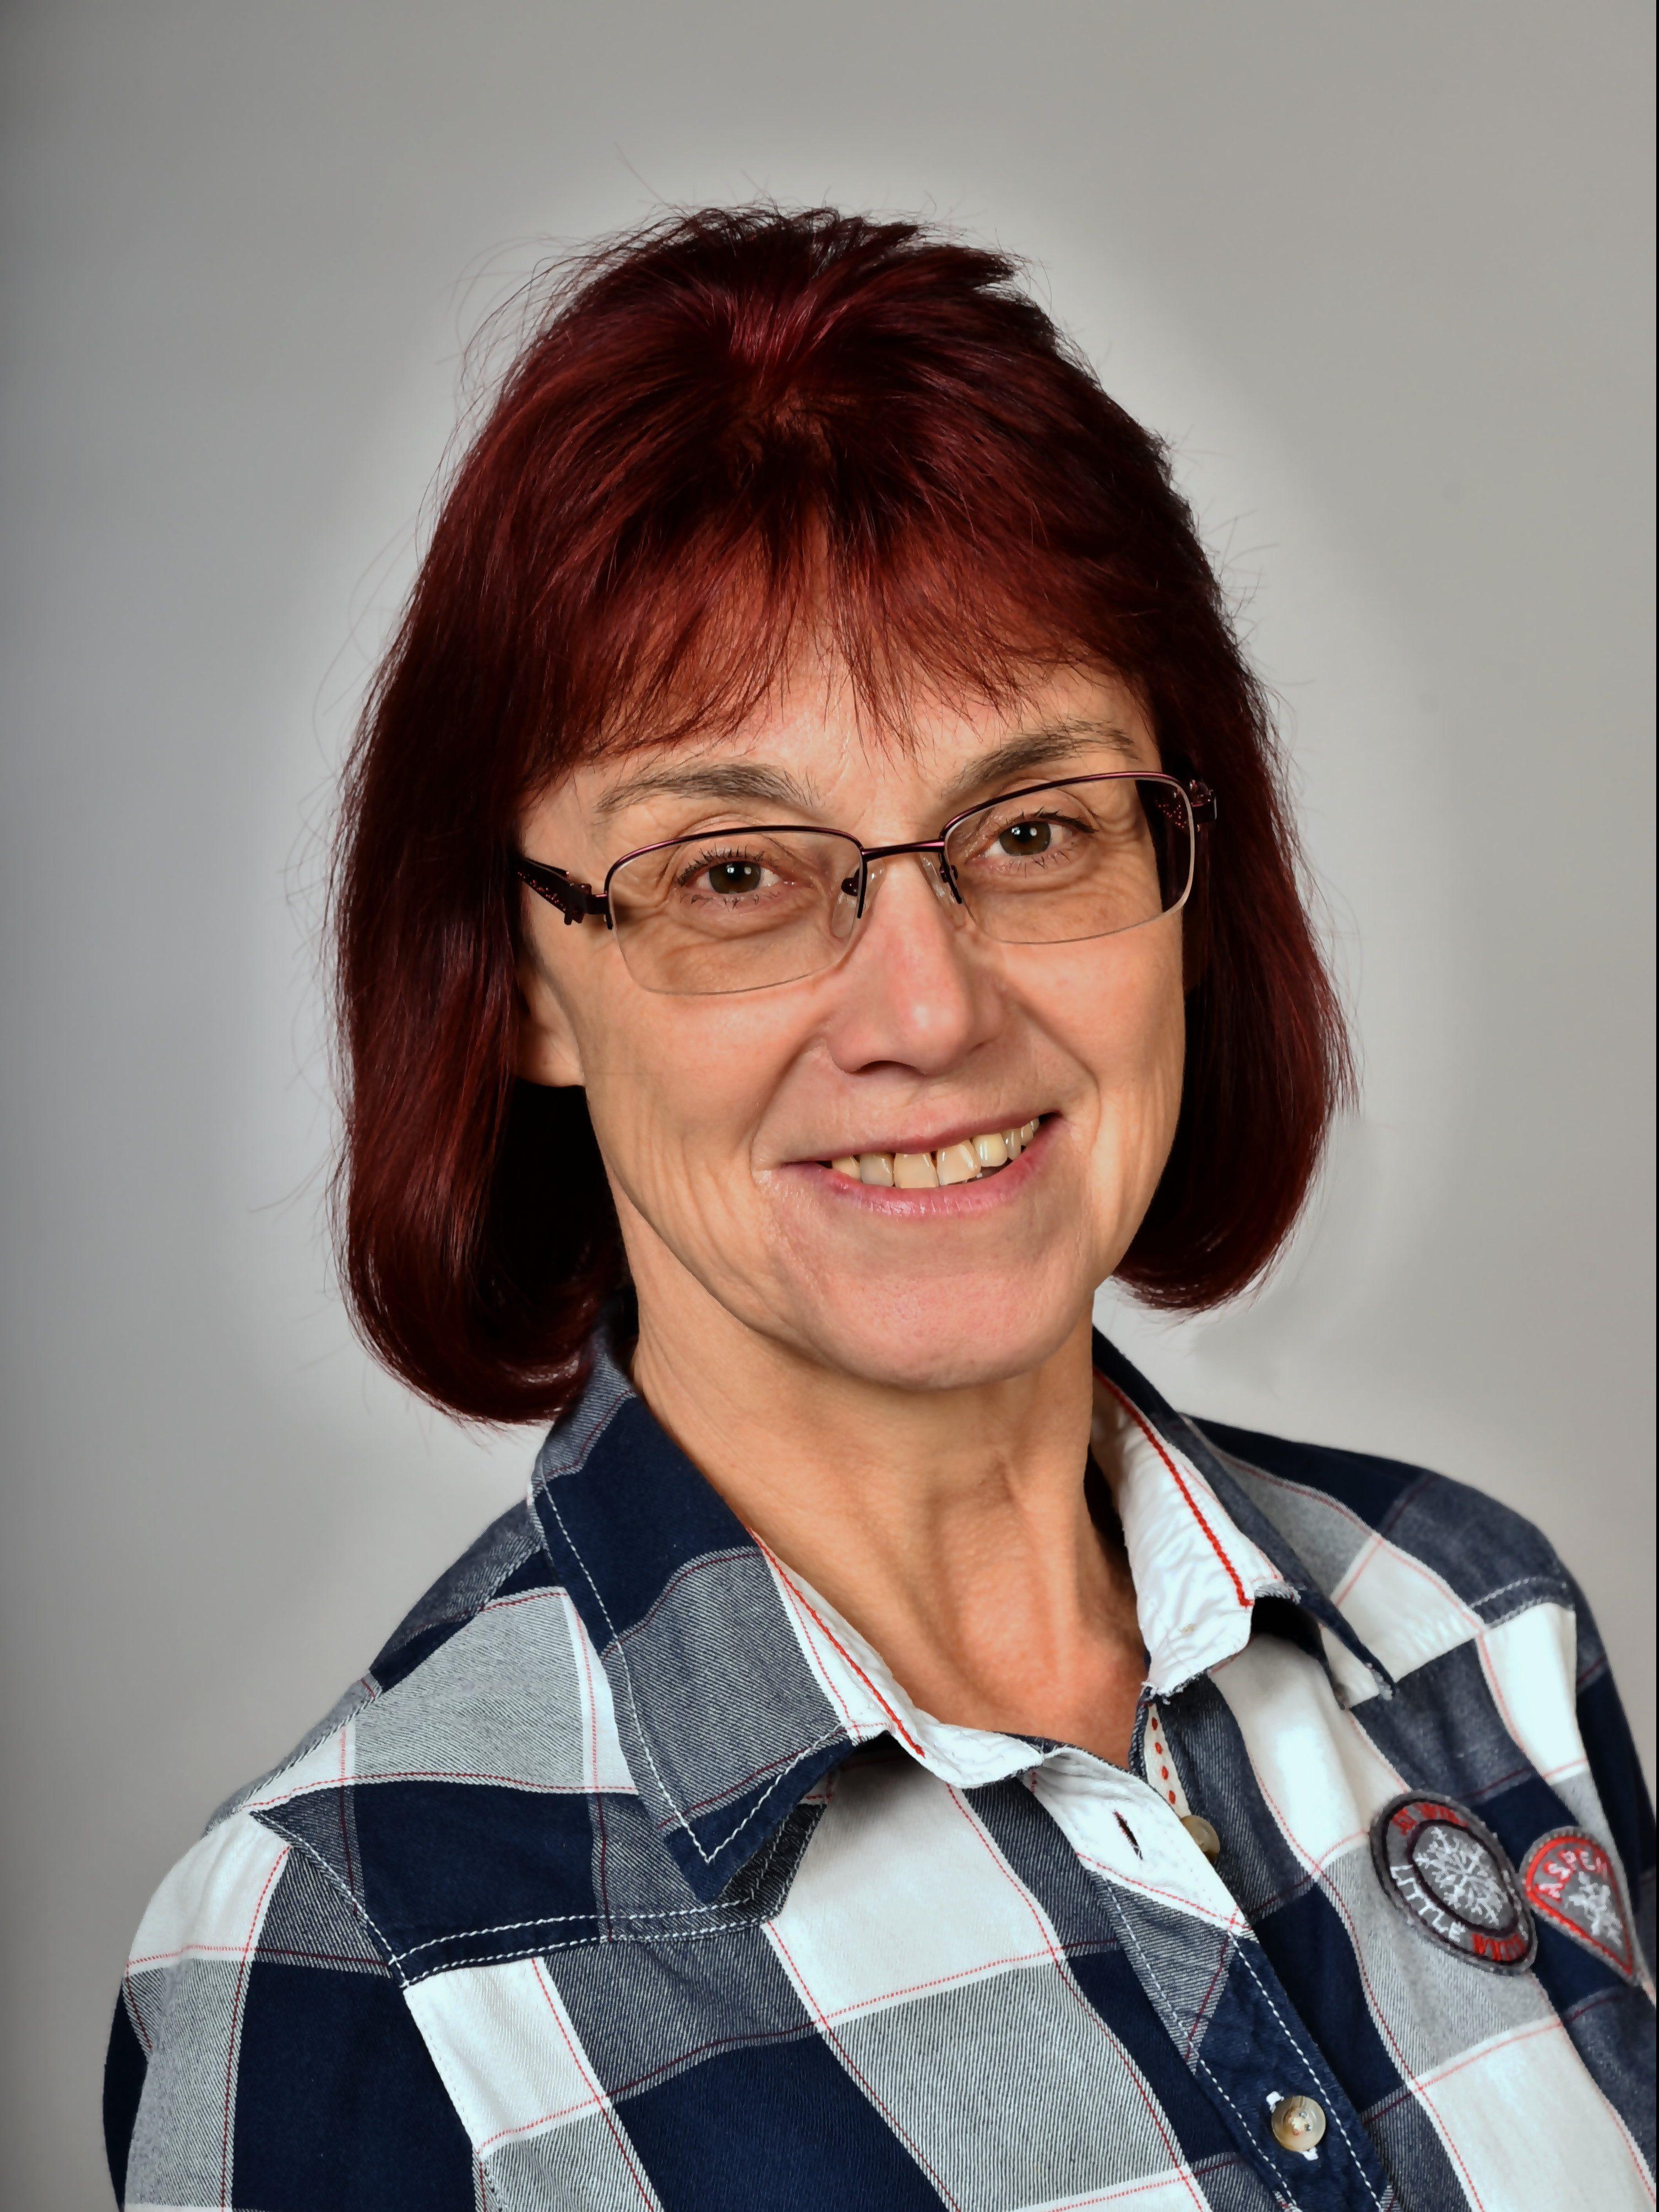 Angela Matthäs